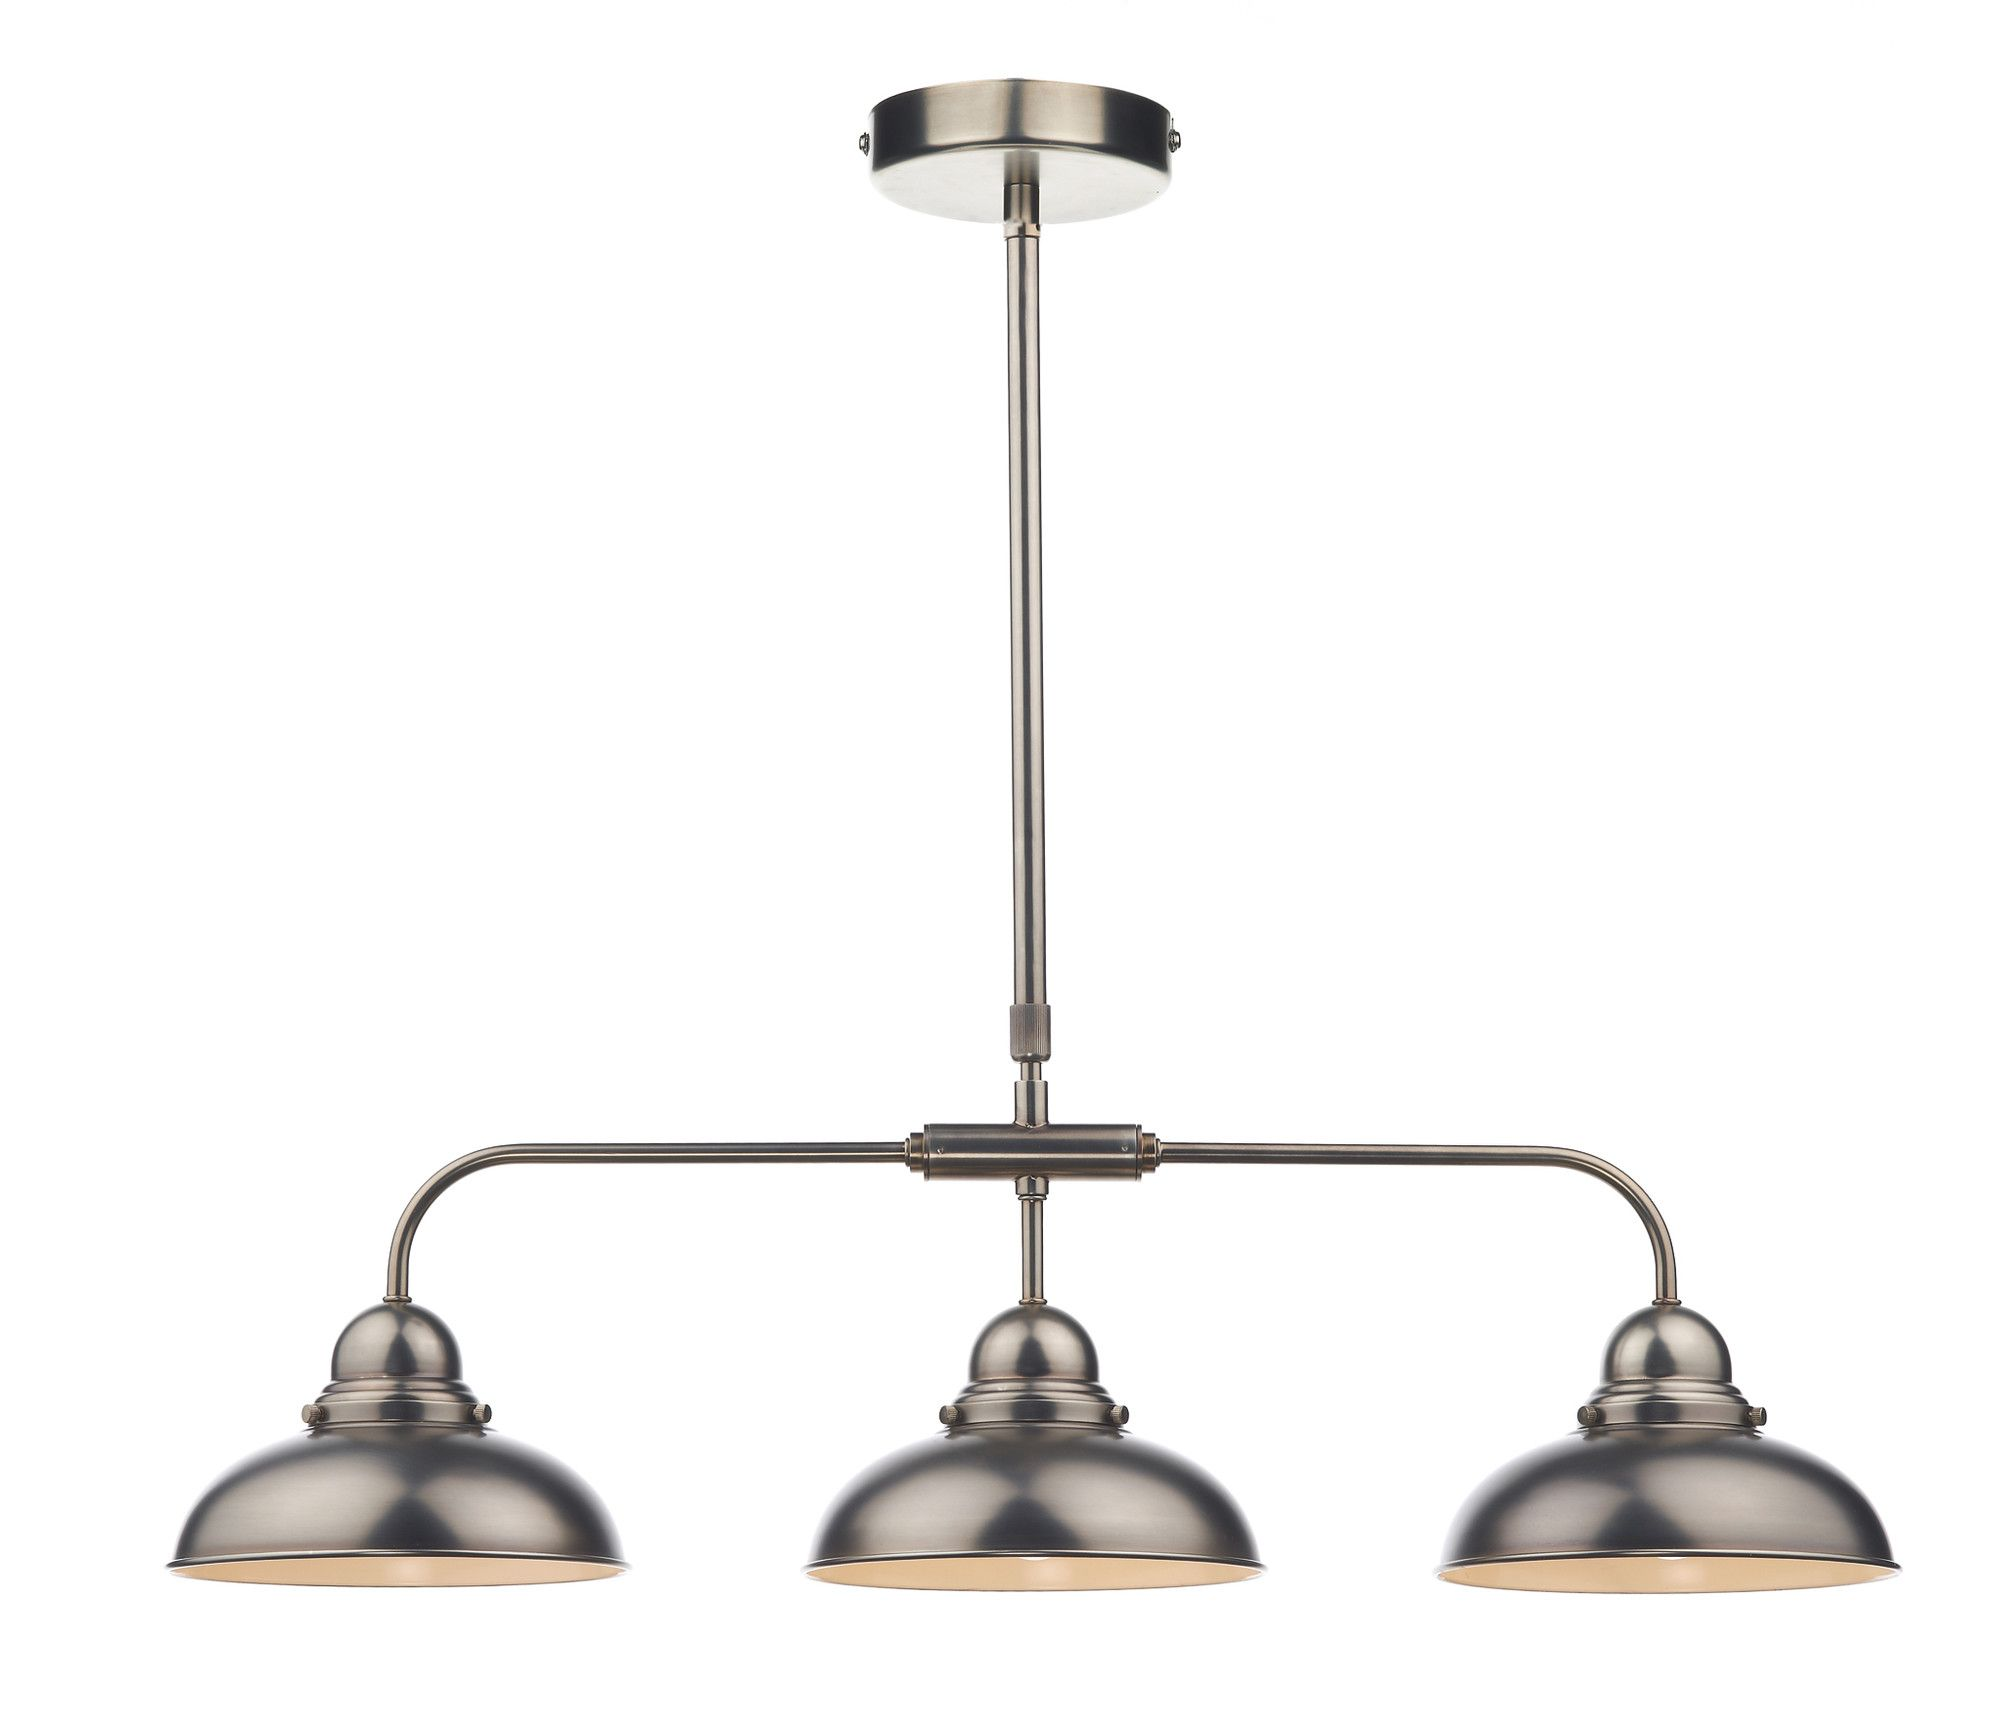 lantern pendant lights for kitchen corner booth seating dar lighting dynamo 3 light island